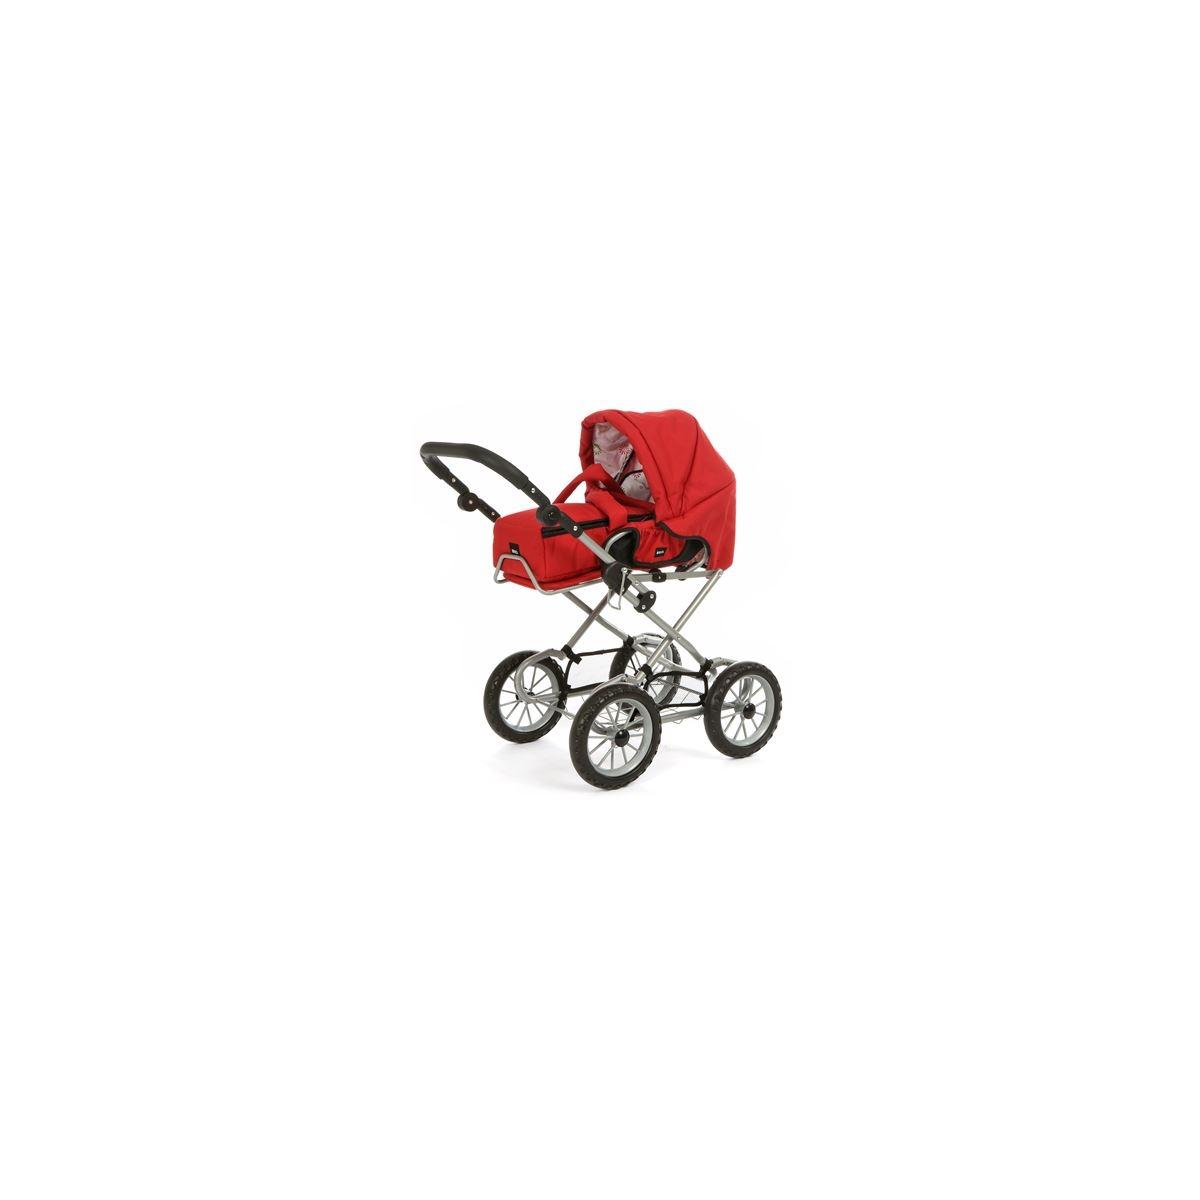 BRIO - Puppenwagen Combi, rot